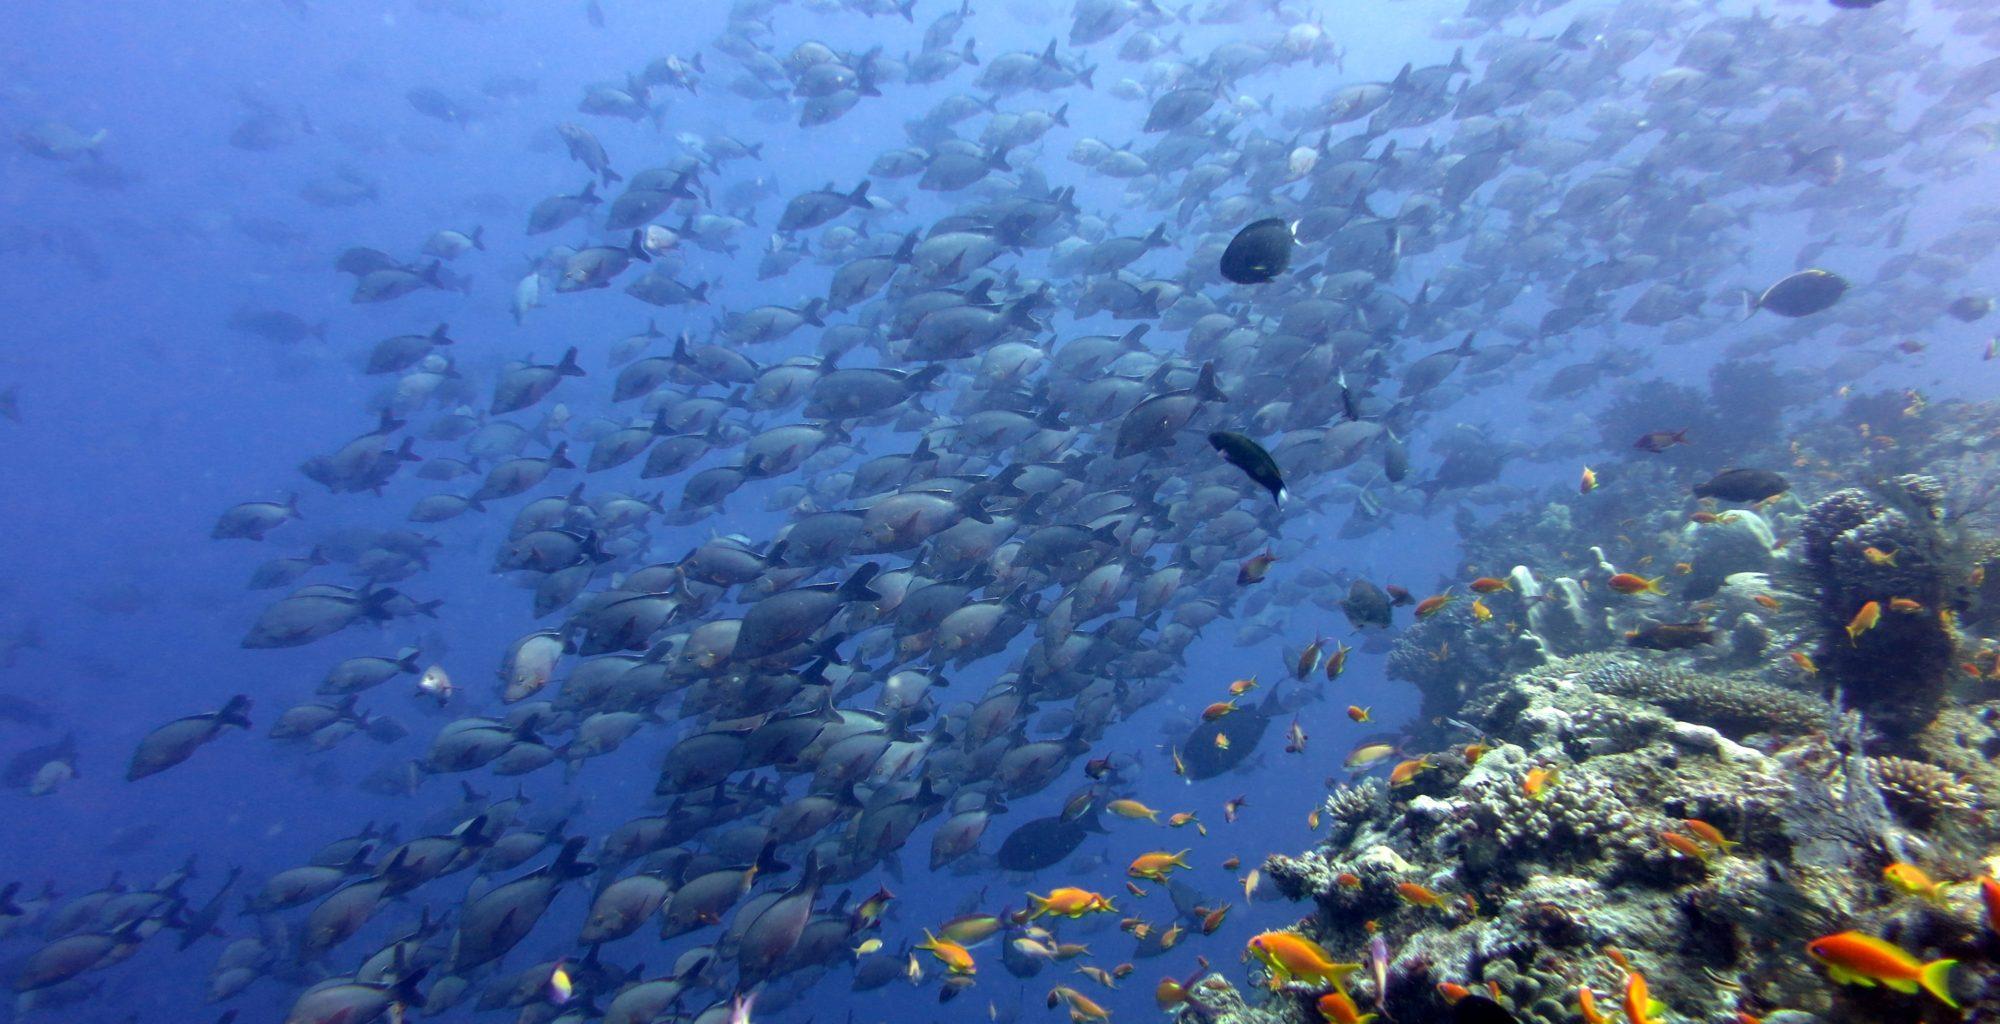 Mozambique-Quirimbas-Vamizi-Lodge-Scuba-Diving